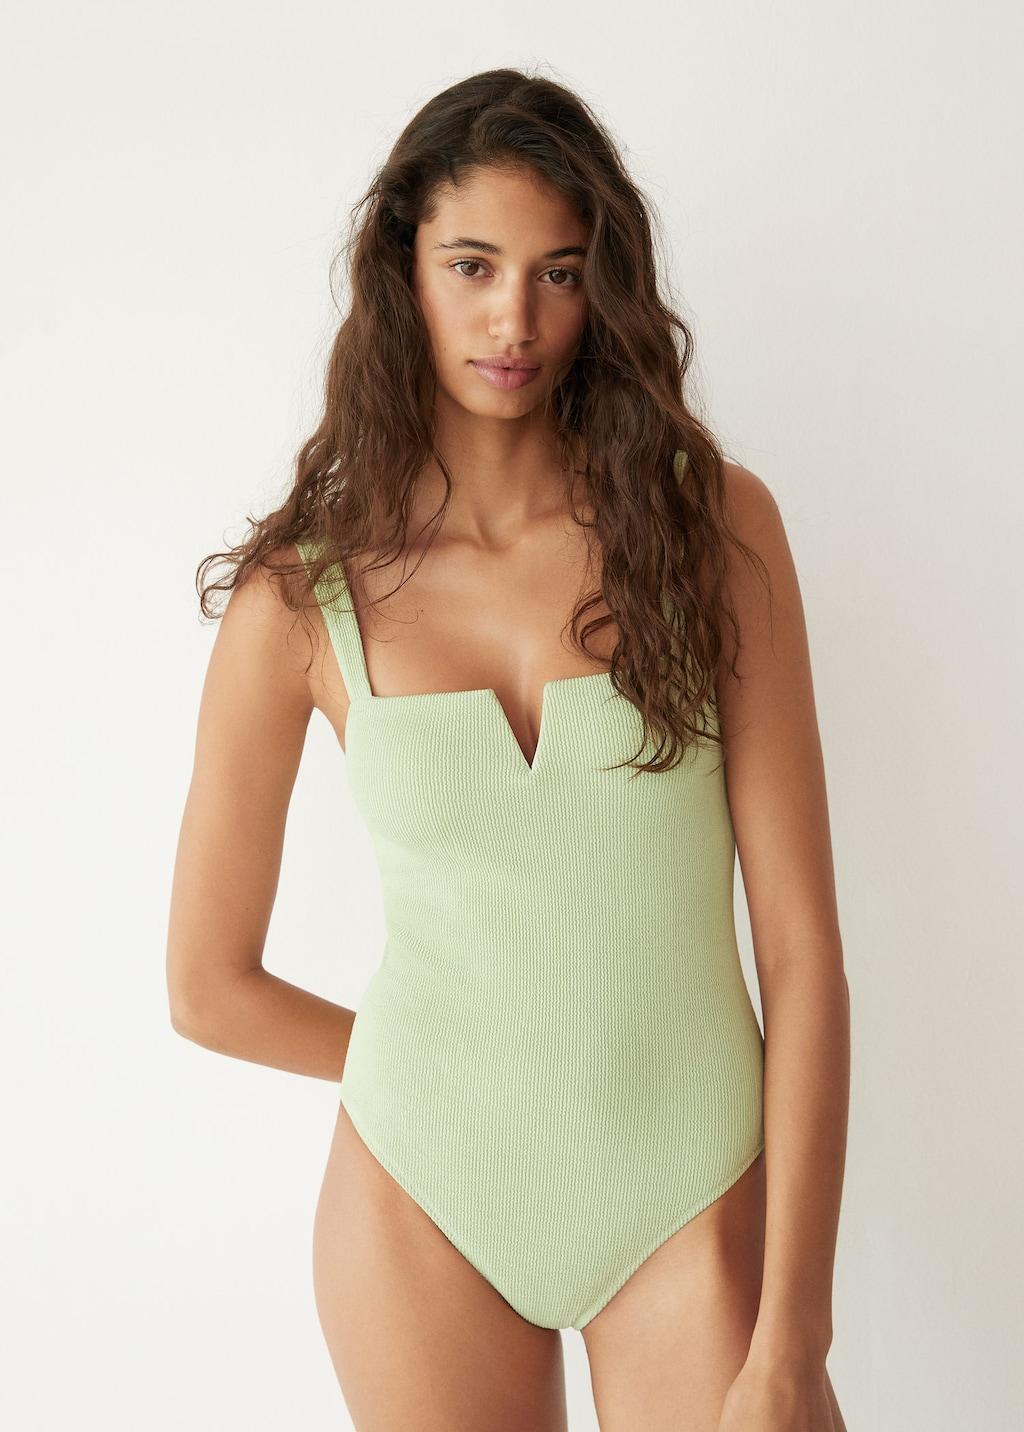 Under $100 swimsuit — stylish pastel green ribbed minimalist swimwear with cutout square neckline